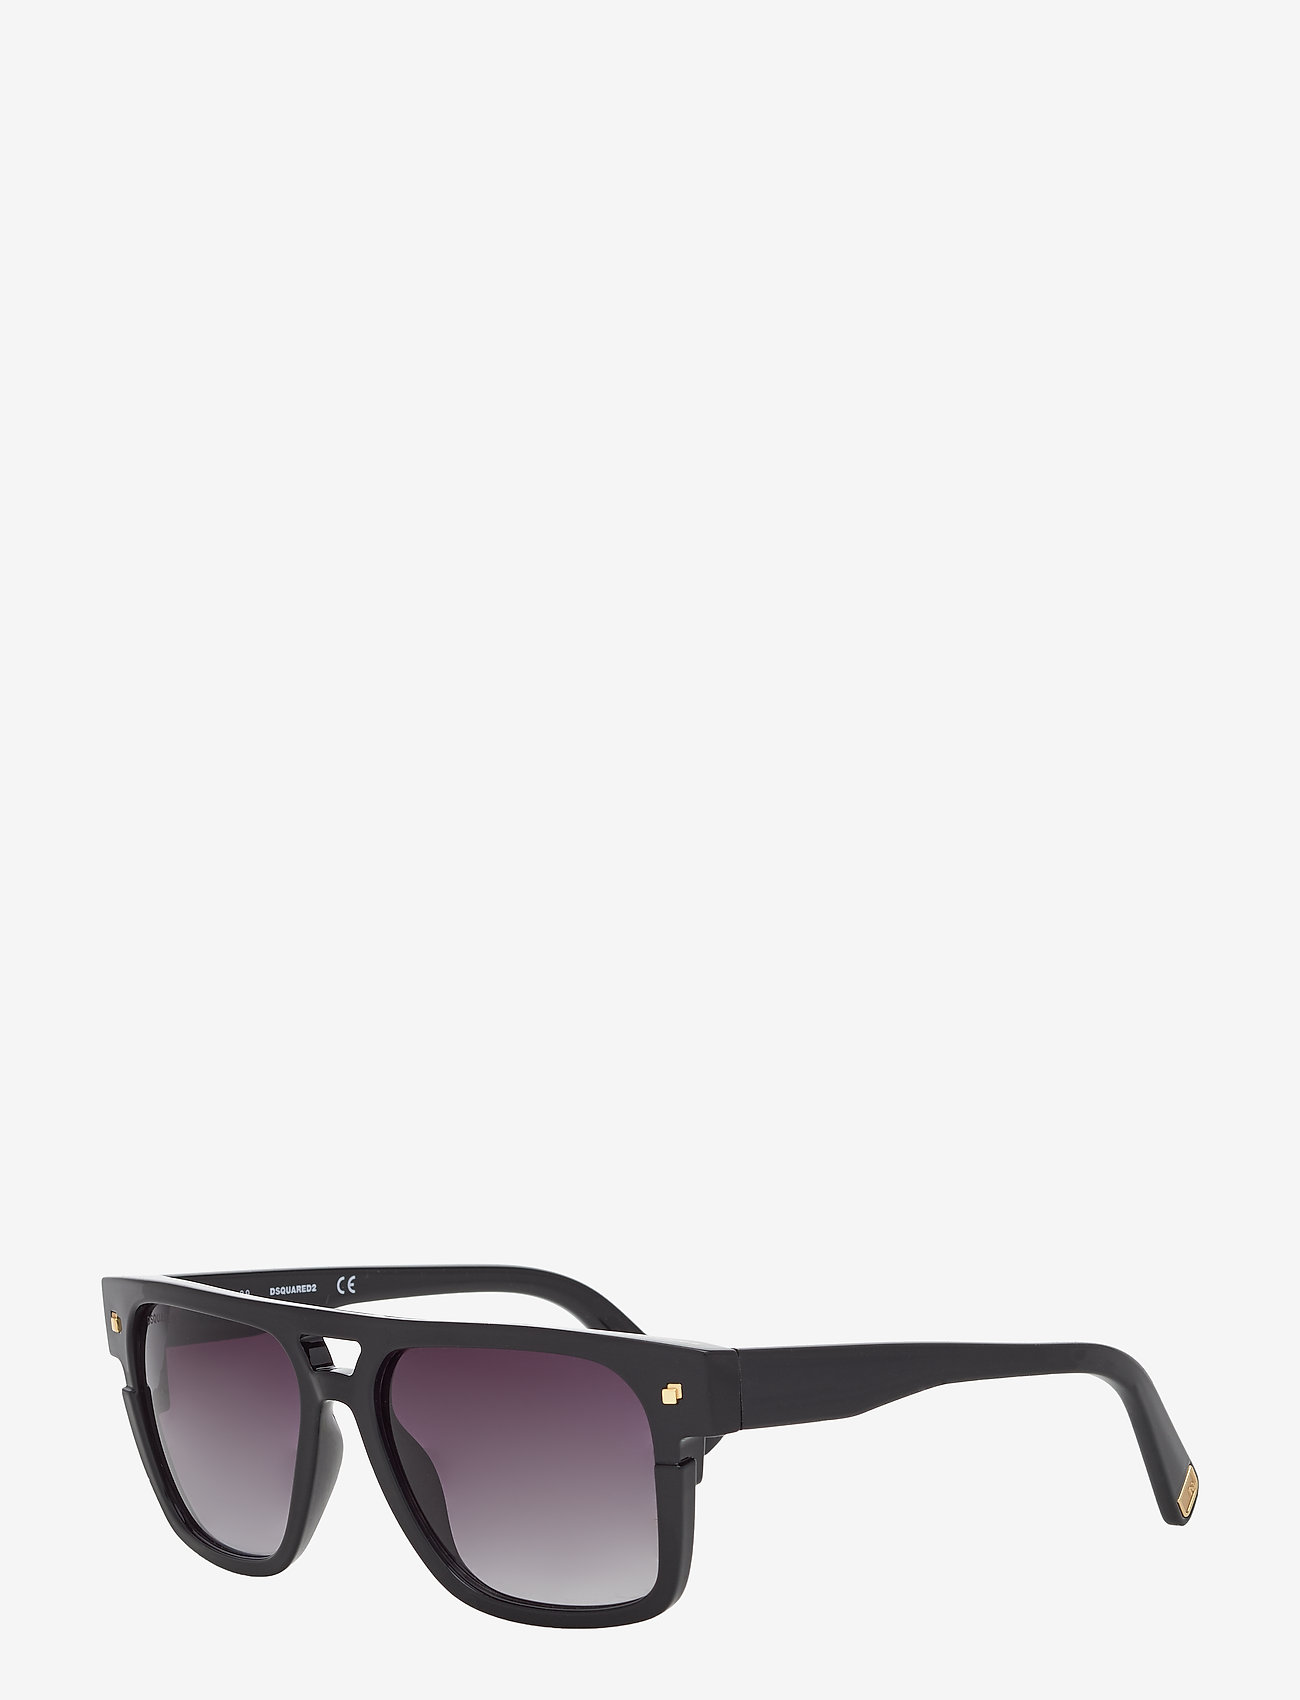 DSQUARED2 Sunglasses - Dsquared VICTOR - d-muotoiset - shiny black - 1